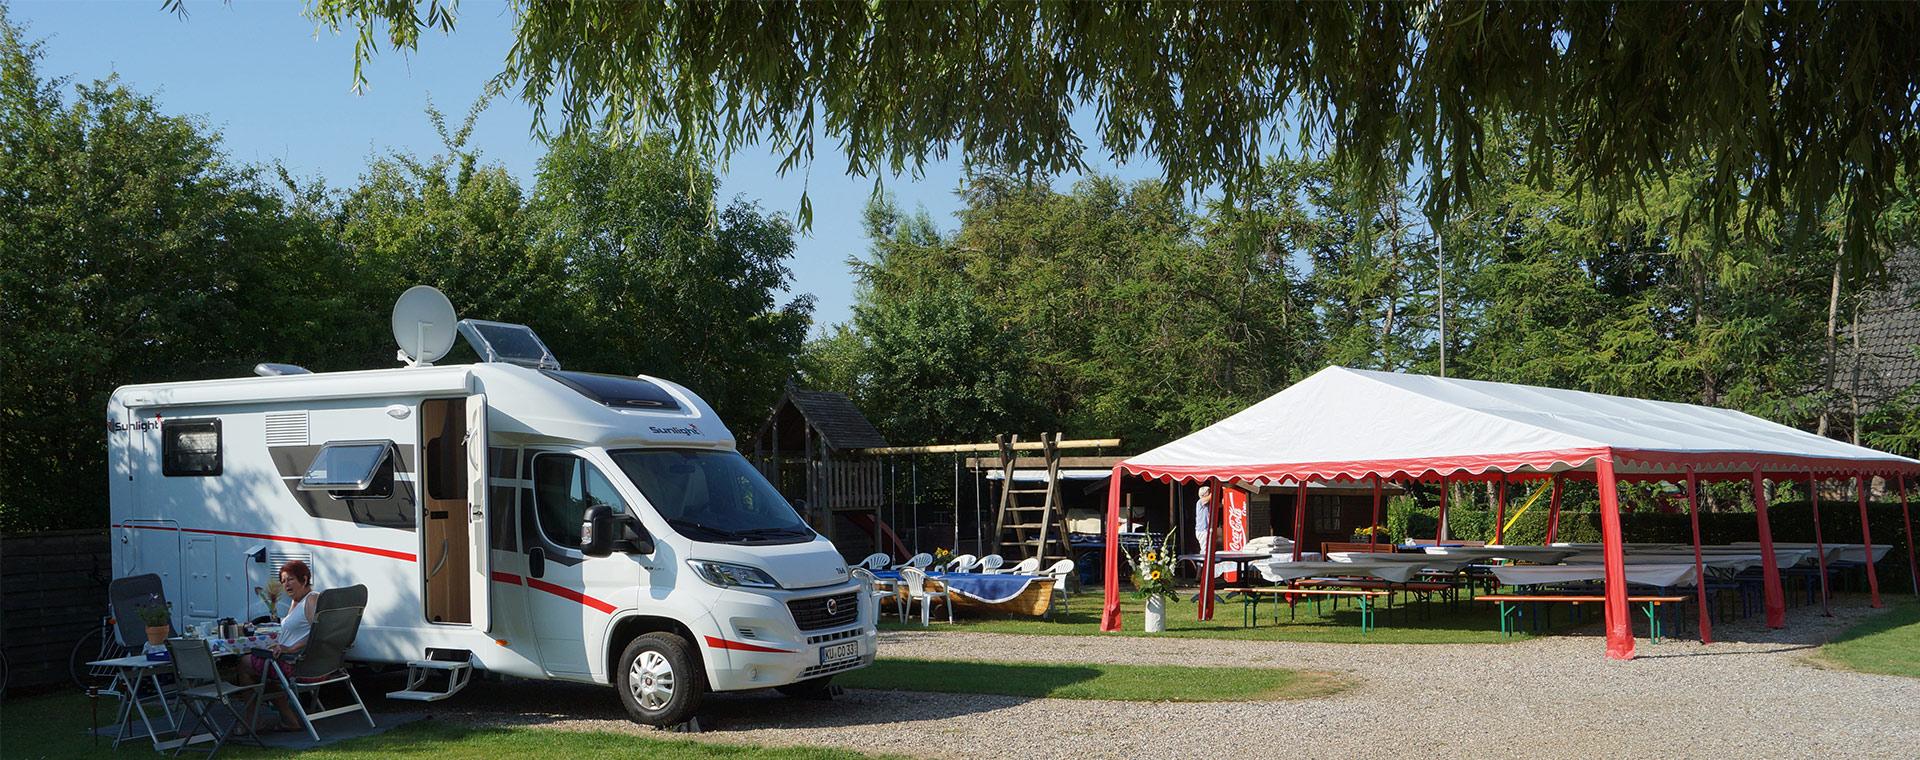 50 Jahre Camping Nordstrand